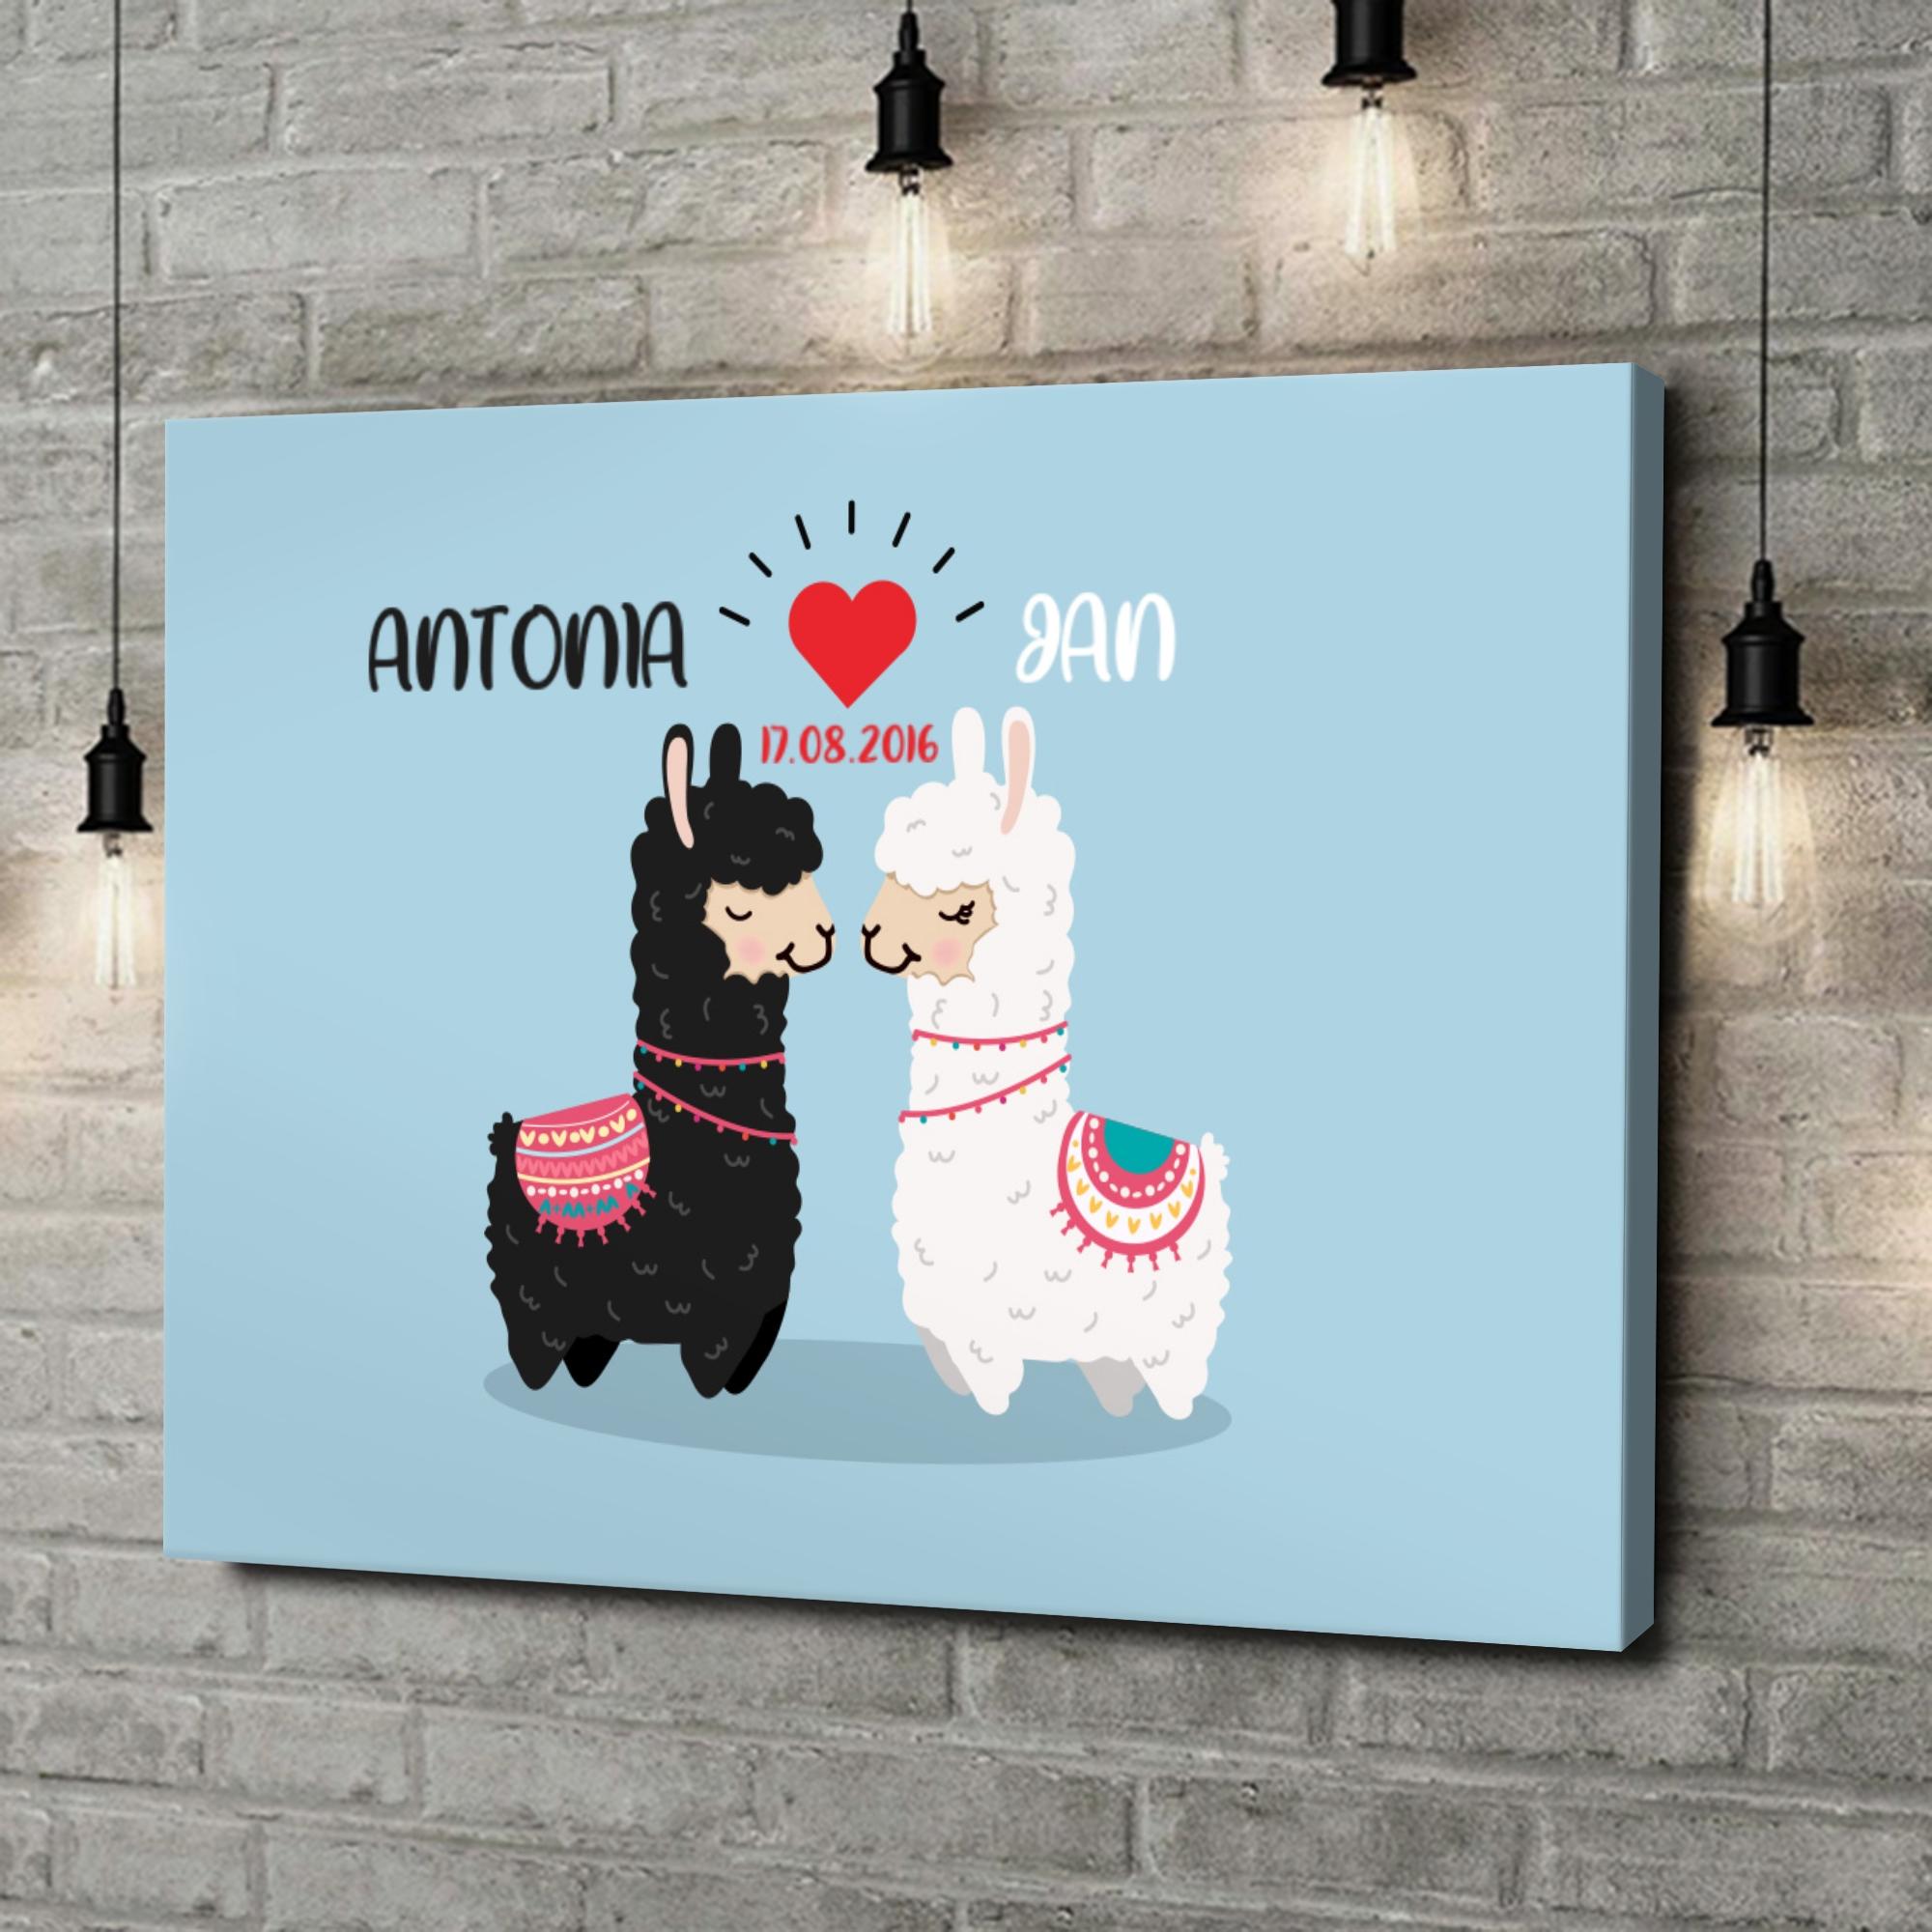 Leinwandbild personalisiert Alpaca-Liebe